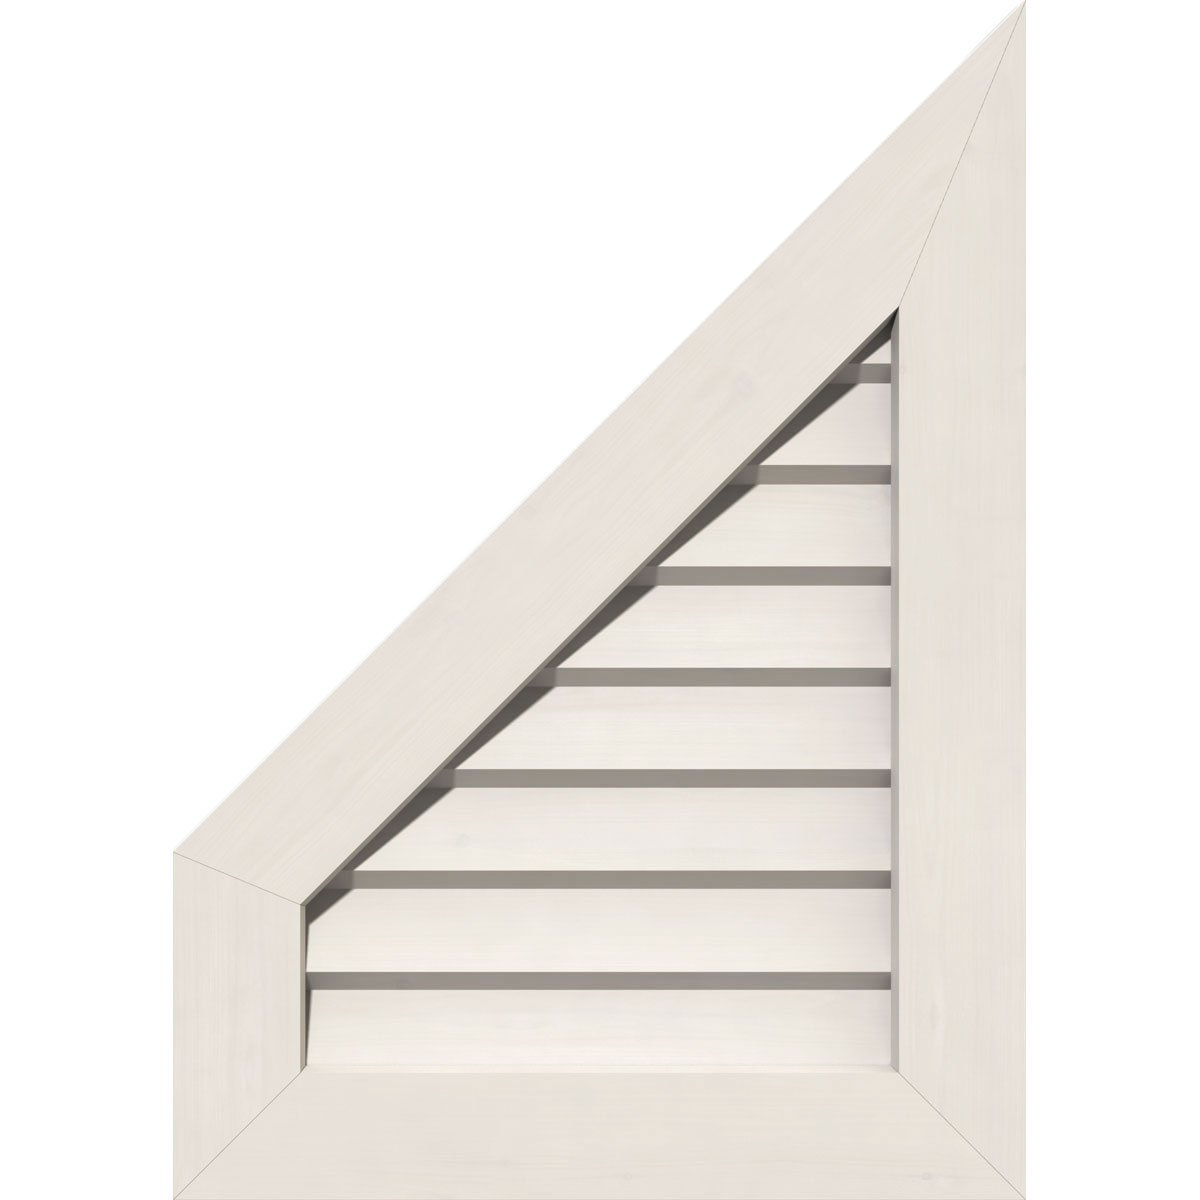 Ekena Millwork GVPPL18X1801DUN-12 Pvc Gable Vent, 18'' W x 18'' H (23'' W x 23'' H Frame Size), White